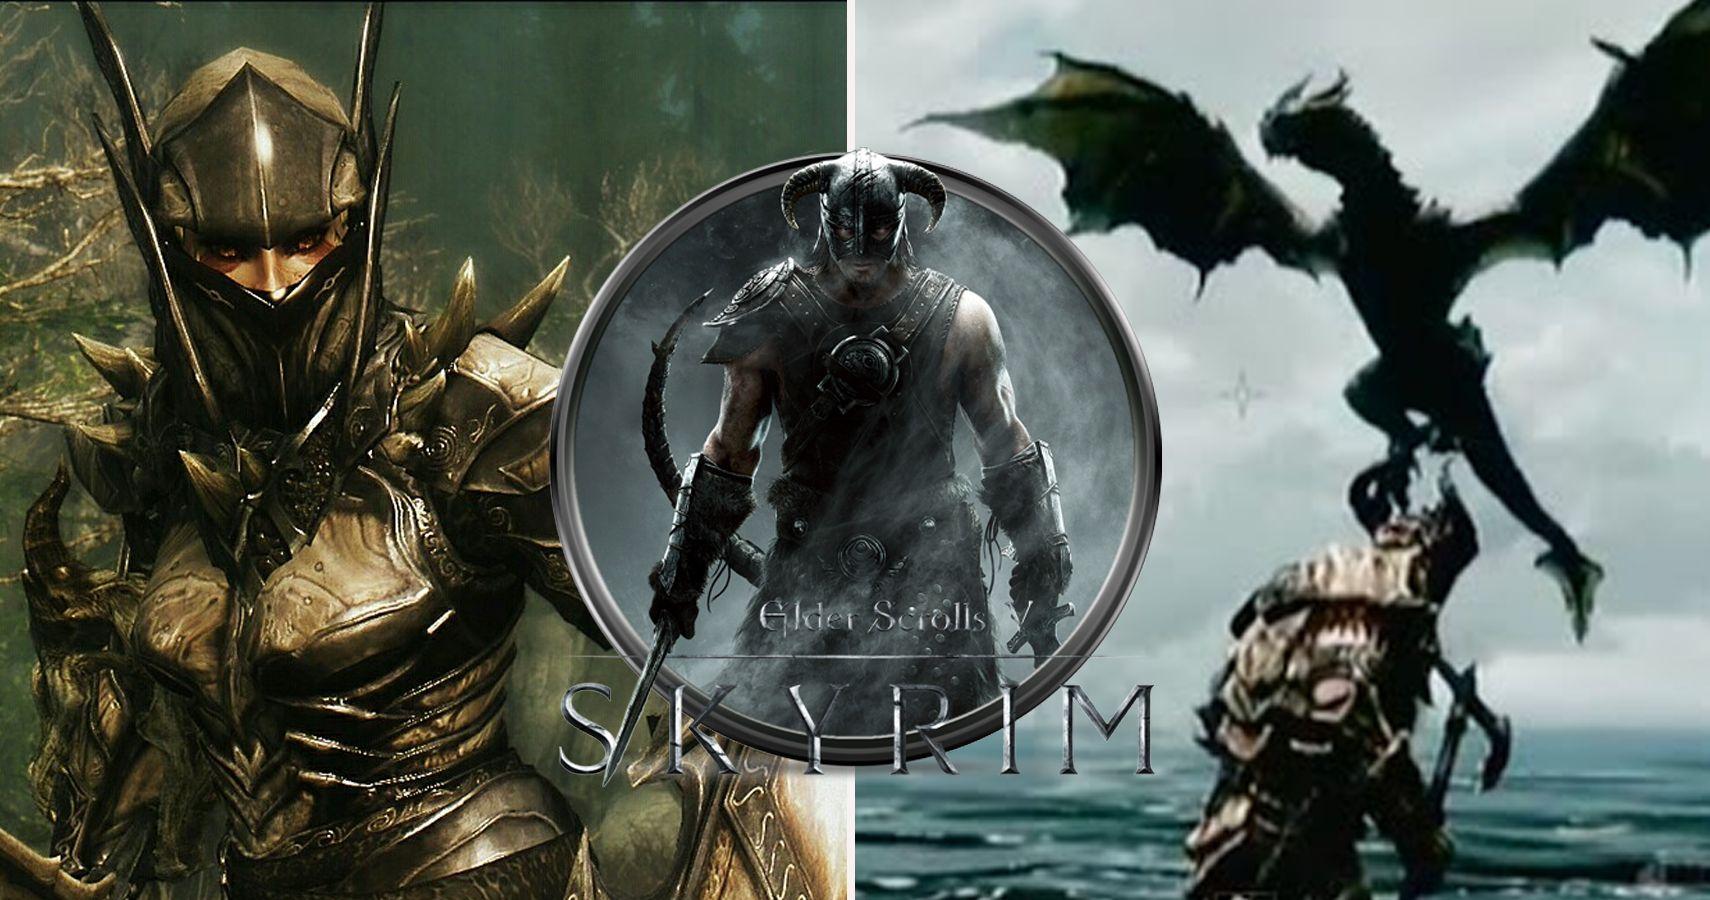 Hidden Secrets You Had No Idea About In Skyrim | TheGamer